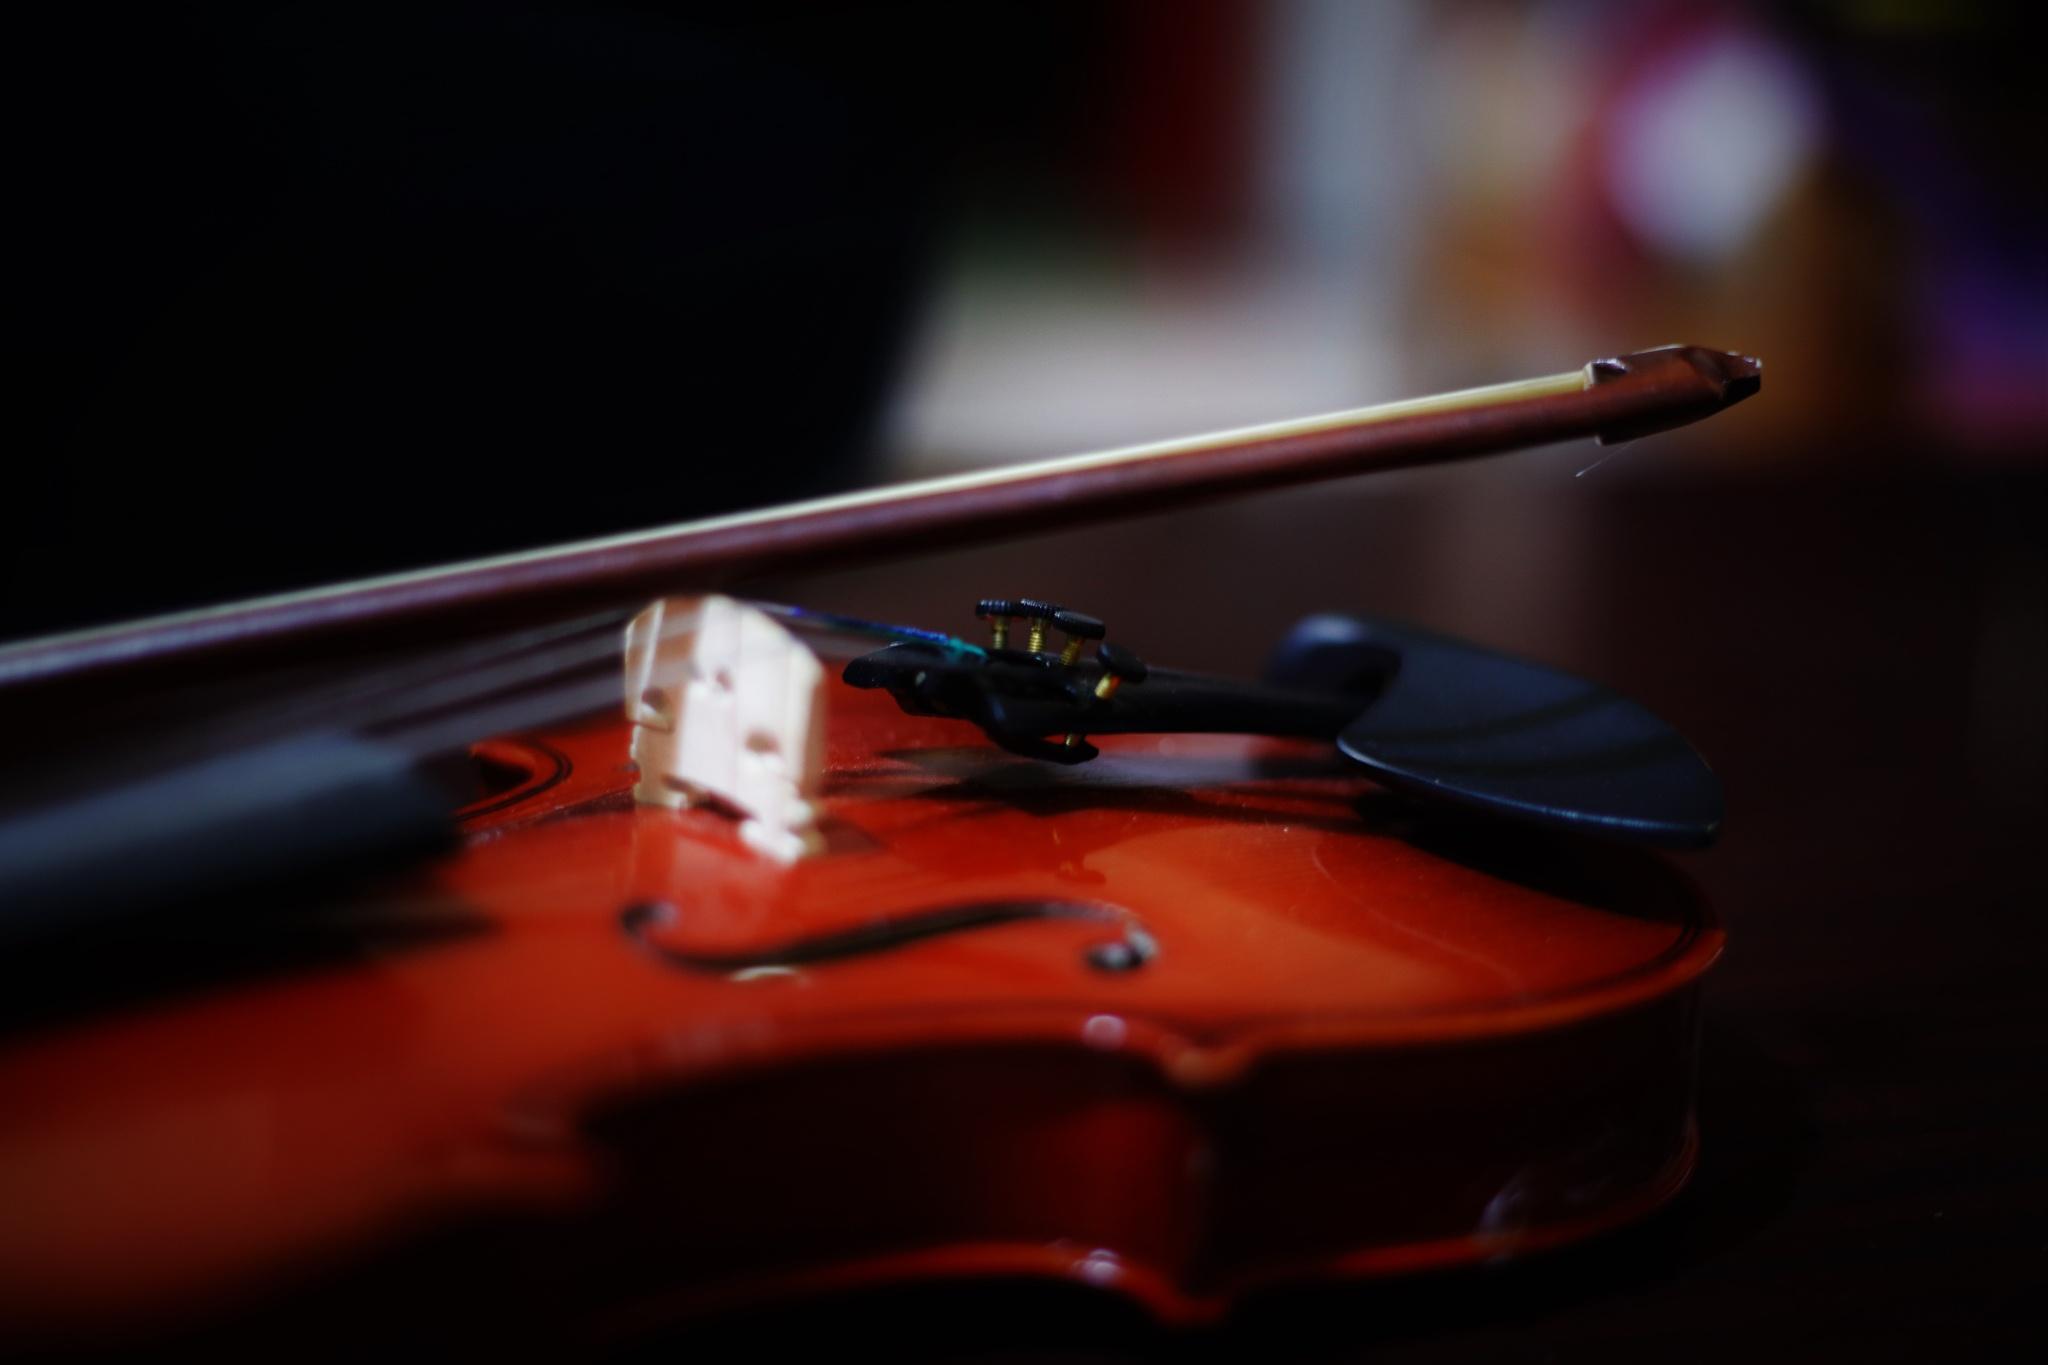 Music by eem ardee